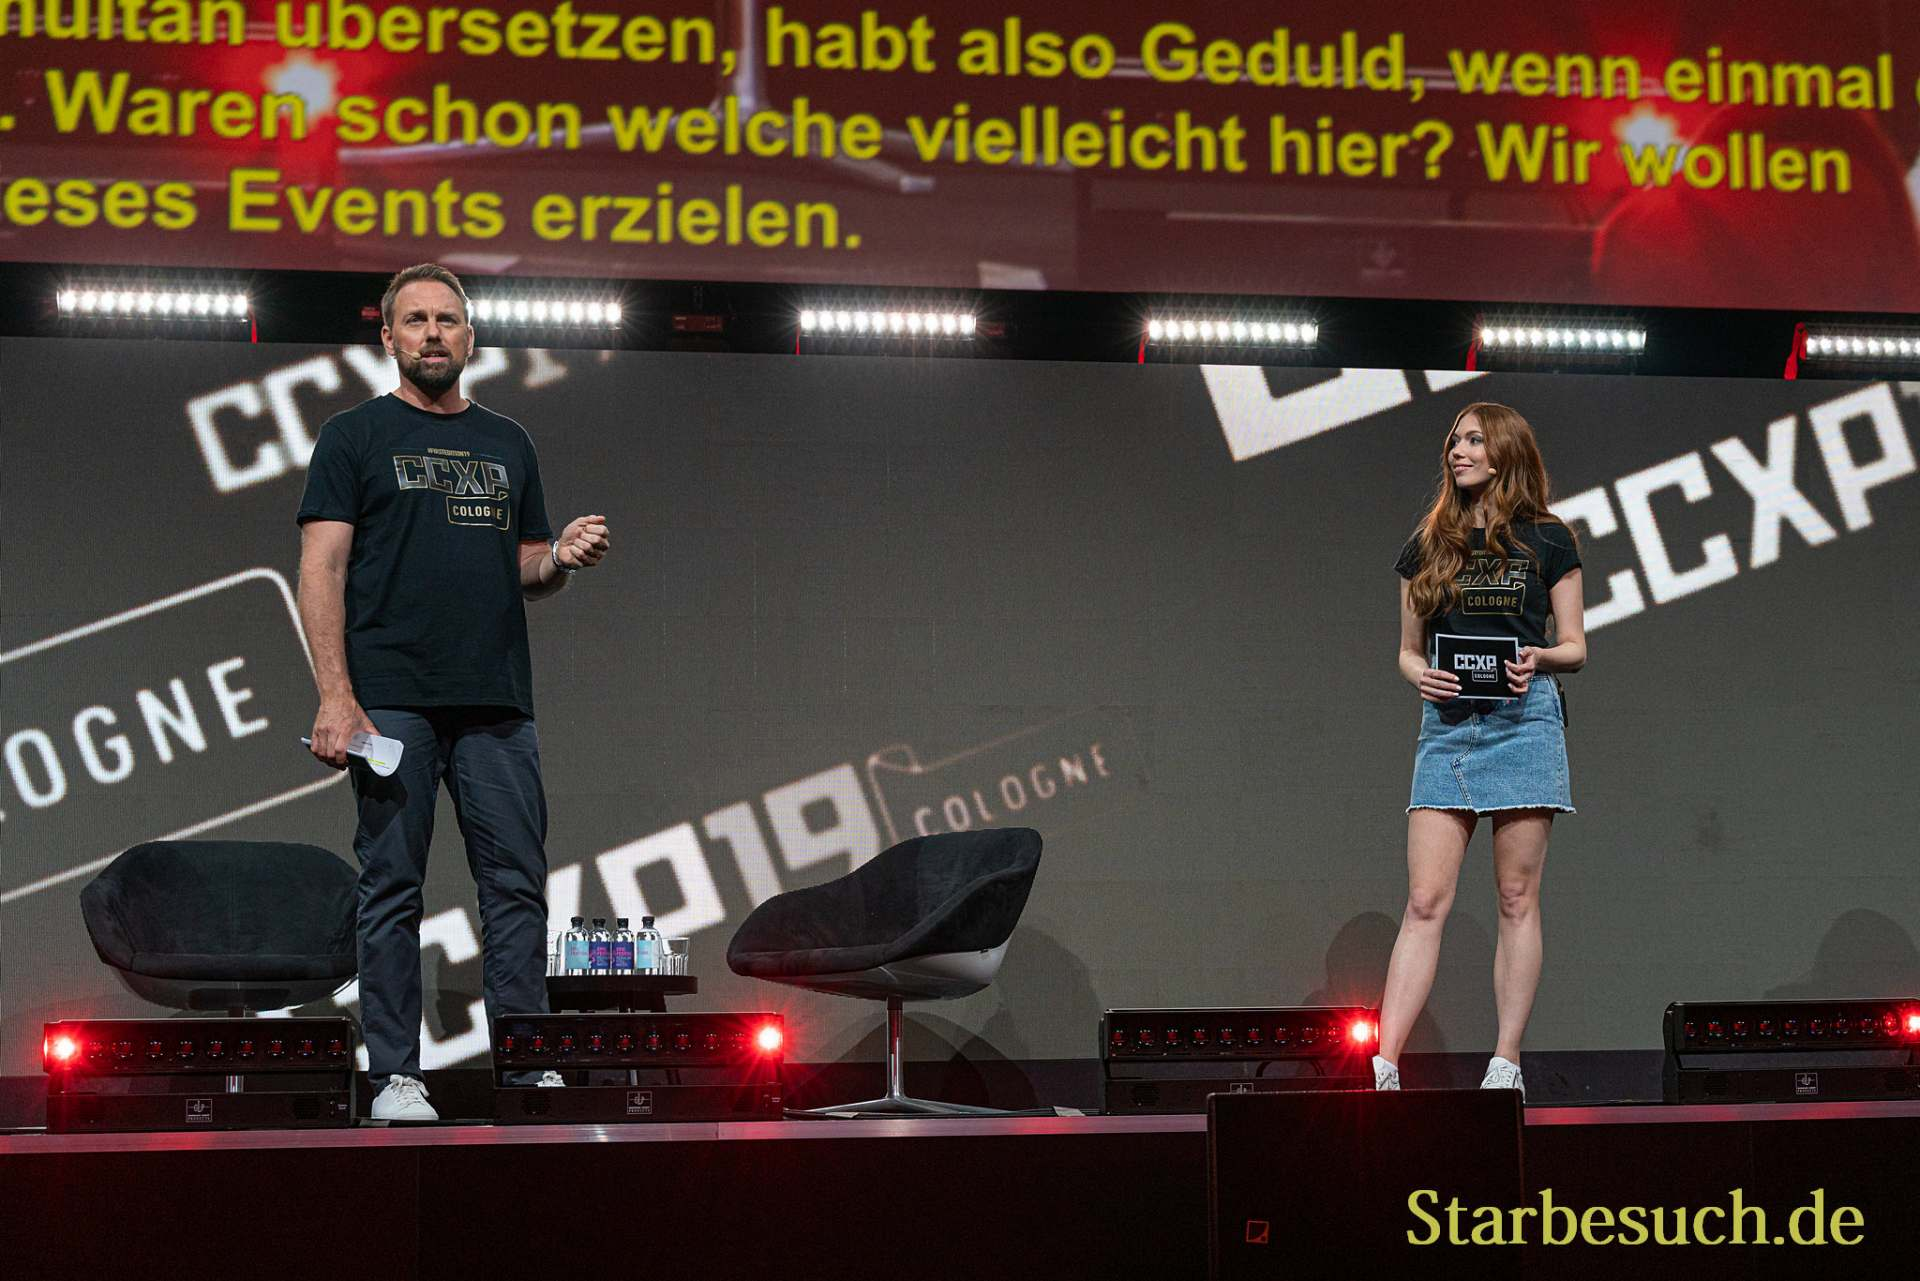 COLOGNE, GERMANY - JUN 28th 2019: Steven Gätjen and Vanessa Christin Poehlmann at CCXP Cologne